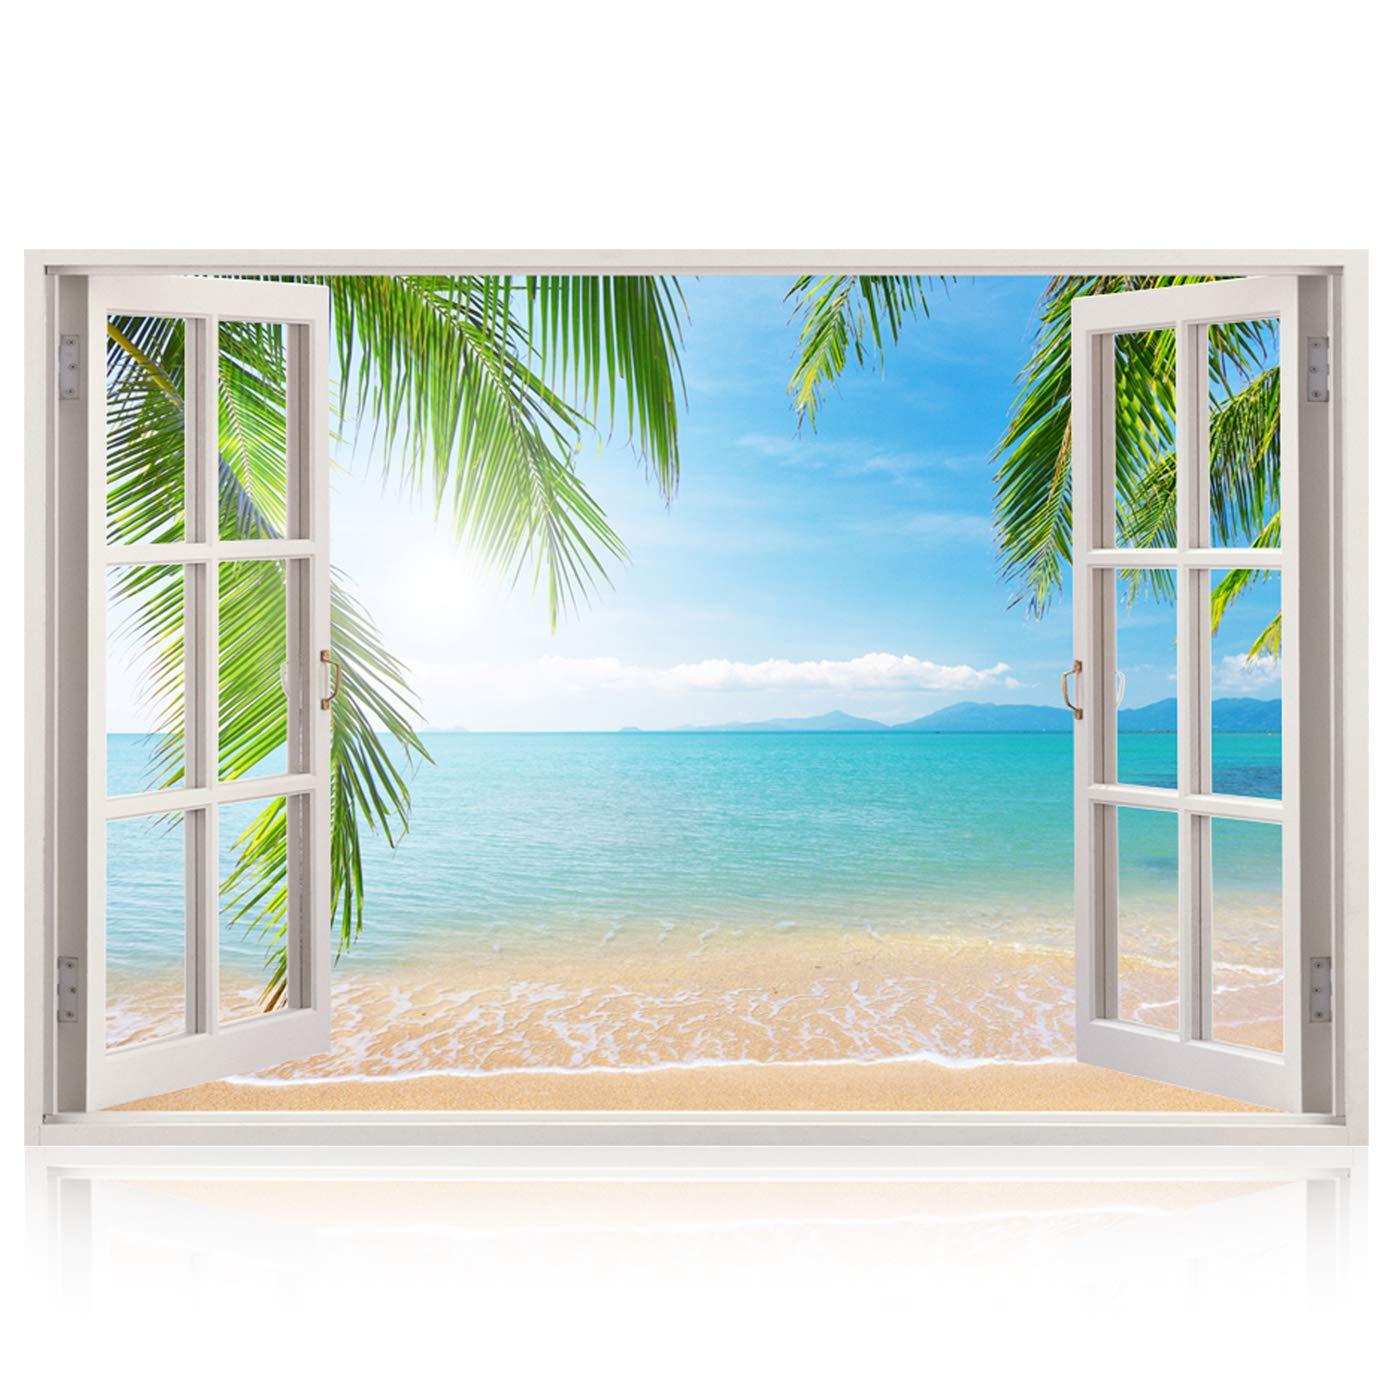 Aufkleber Wandtattoo Geoffnetes Fenster Fototapete Deal Www